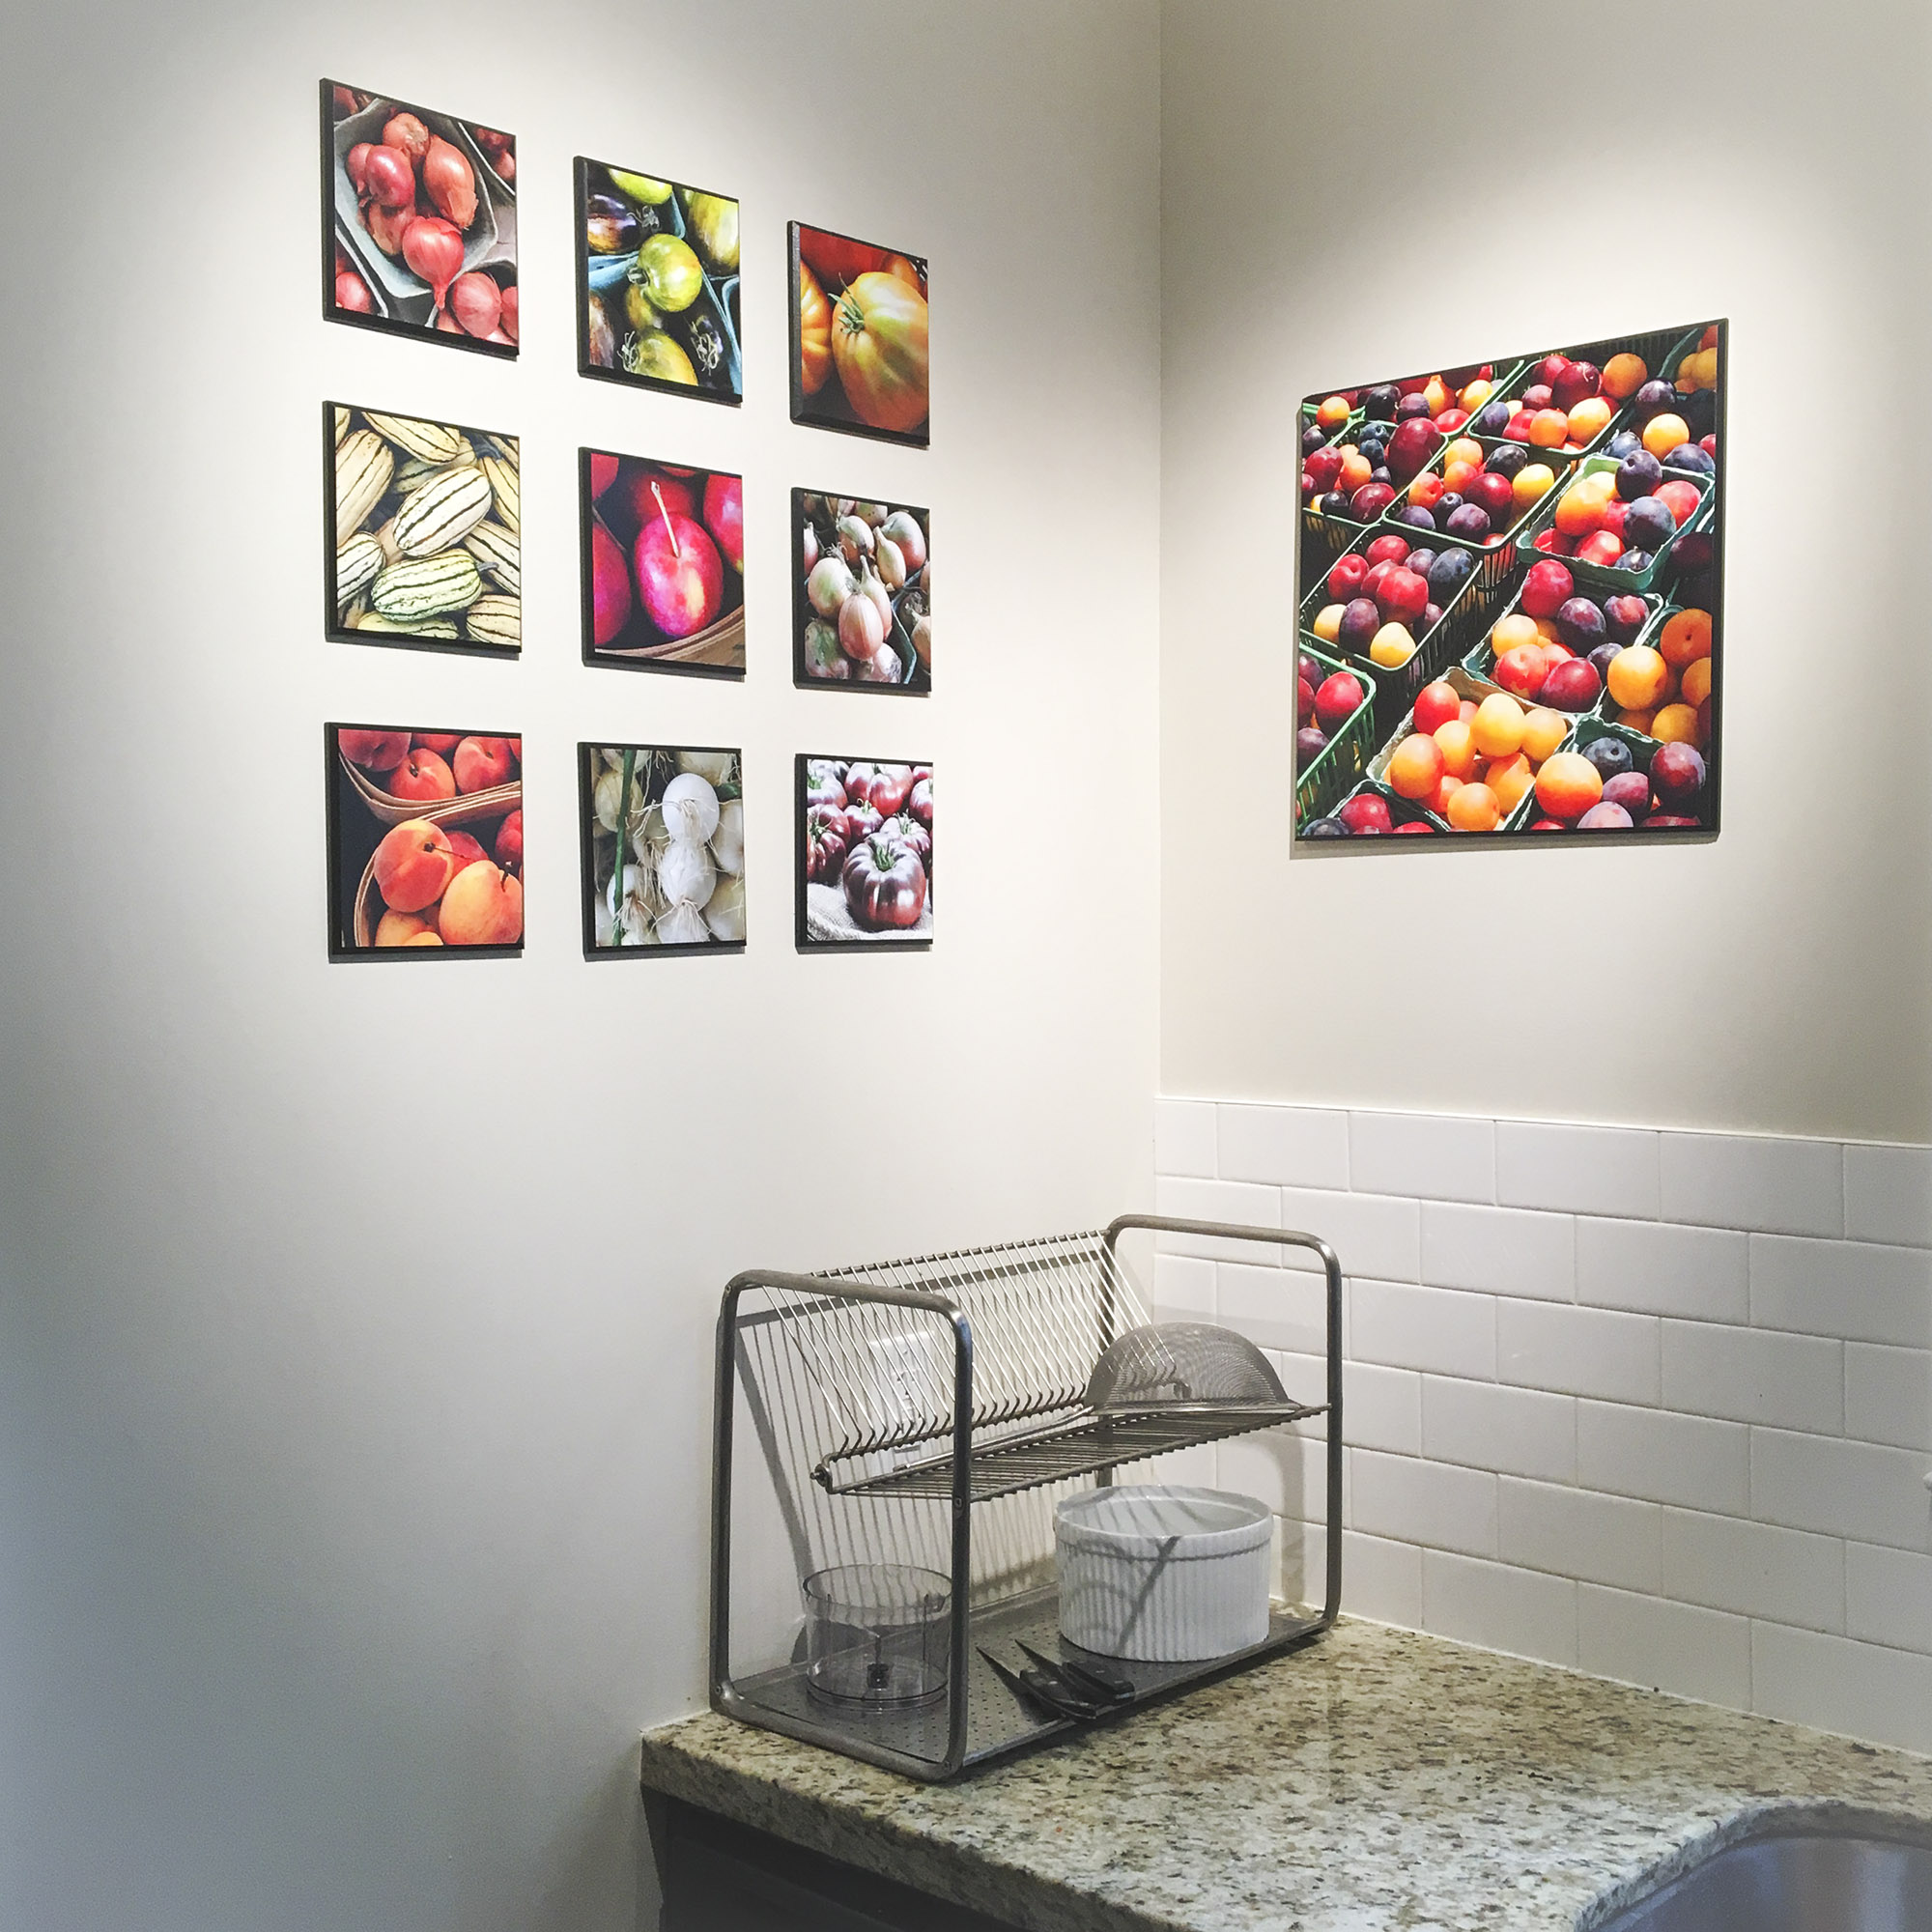 kitchen art remodel price boards vegetables forward vegfwd sqsp jpg